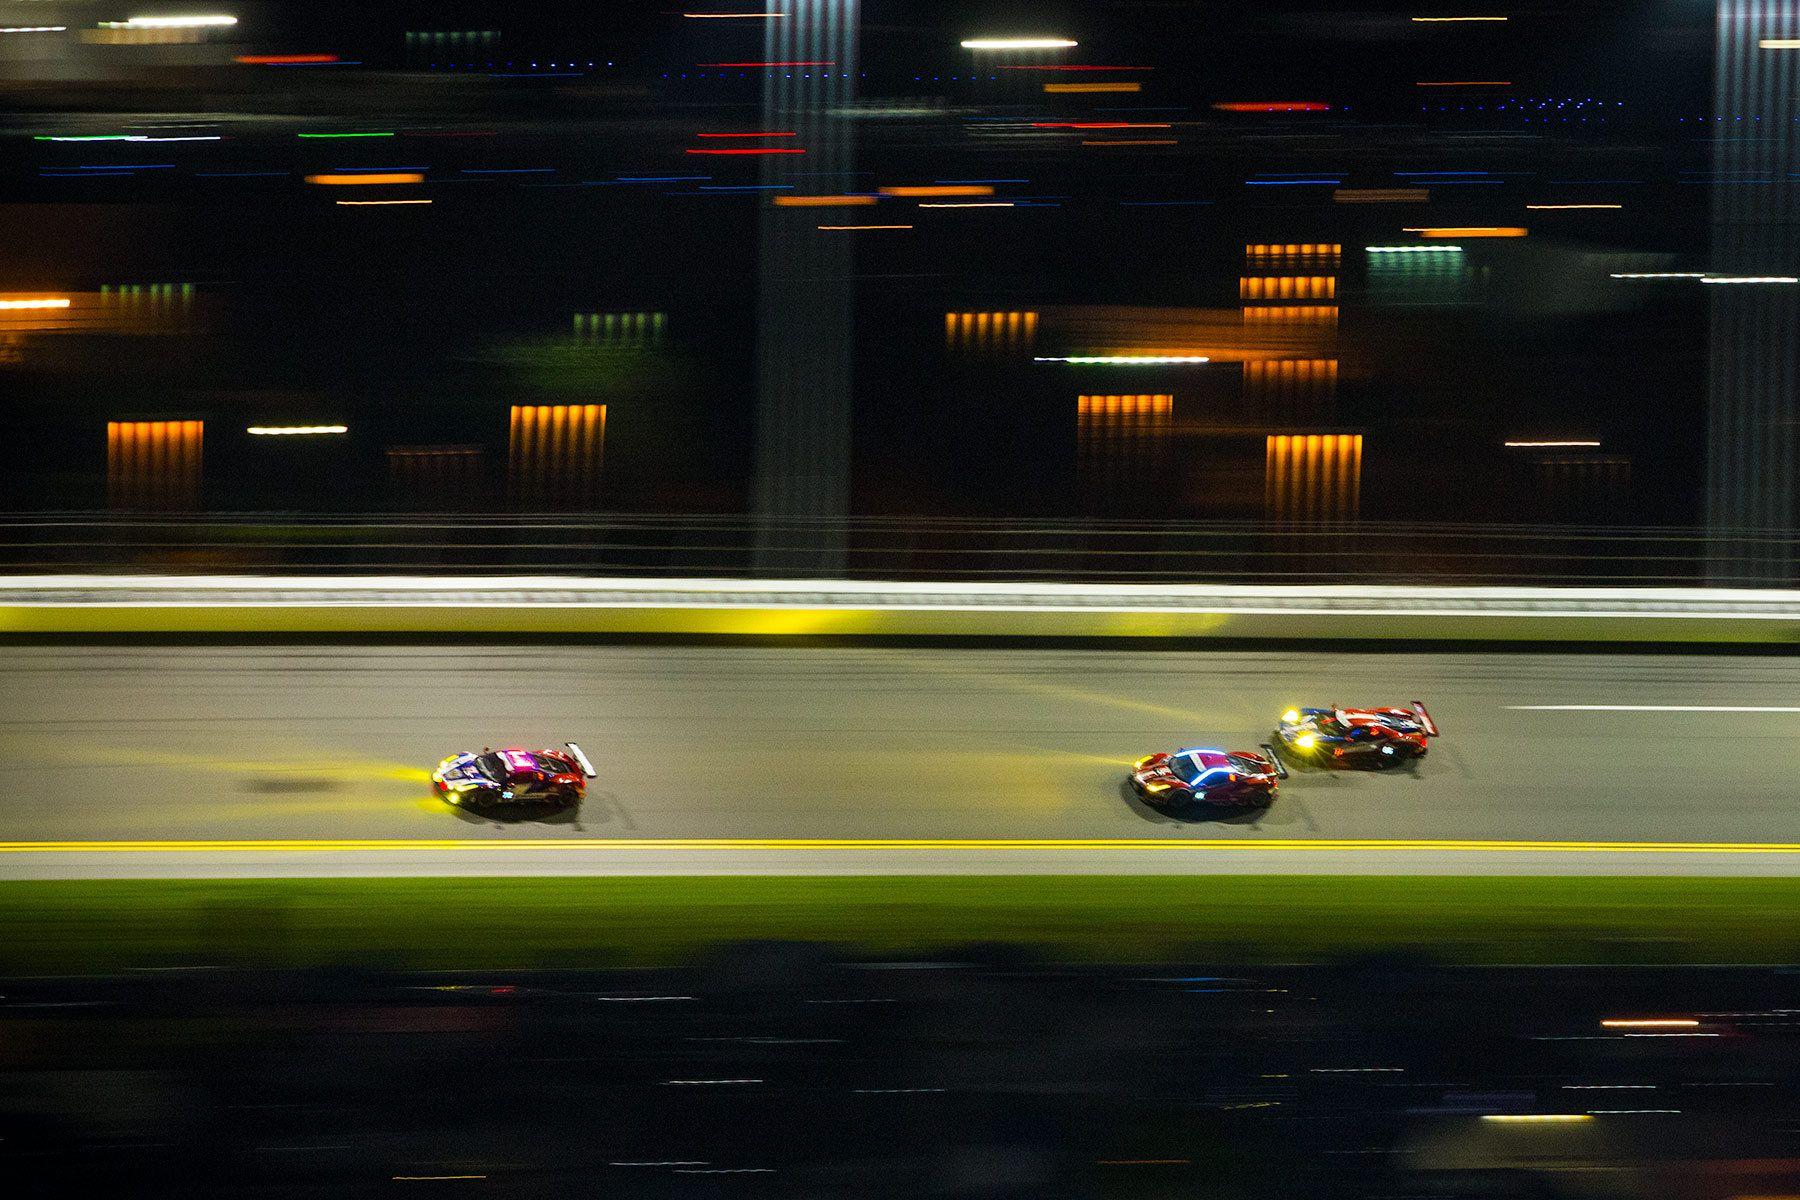 Client: International Speedway Corporation